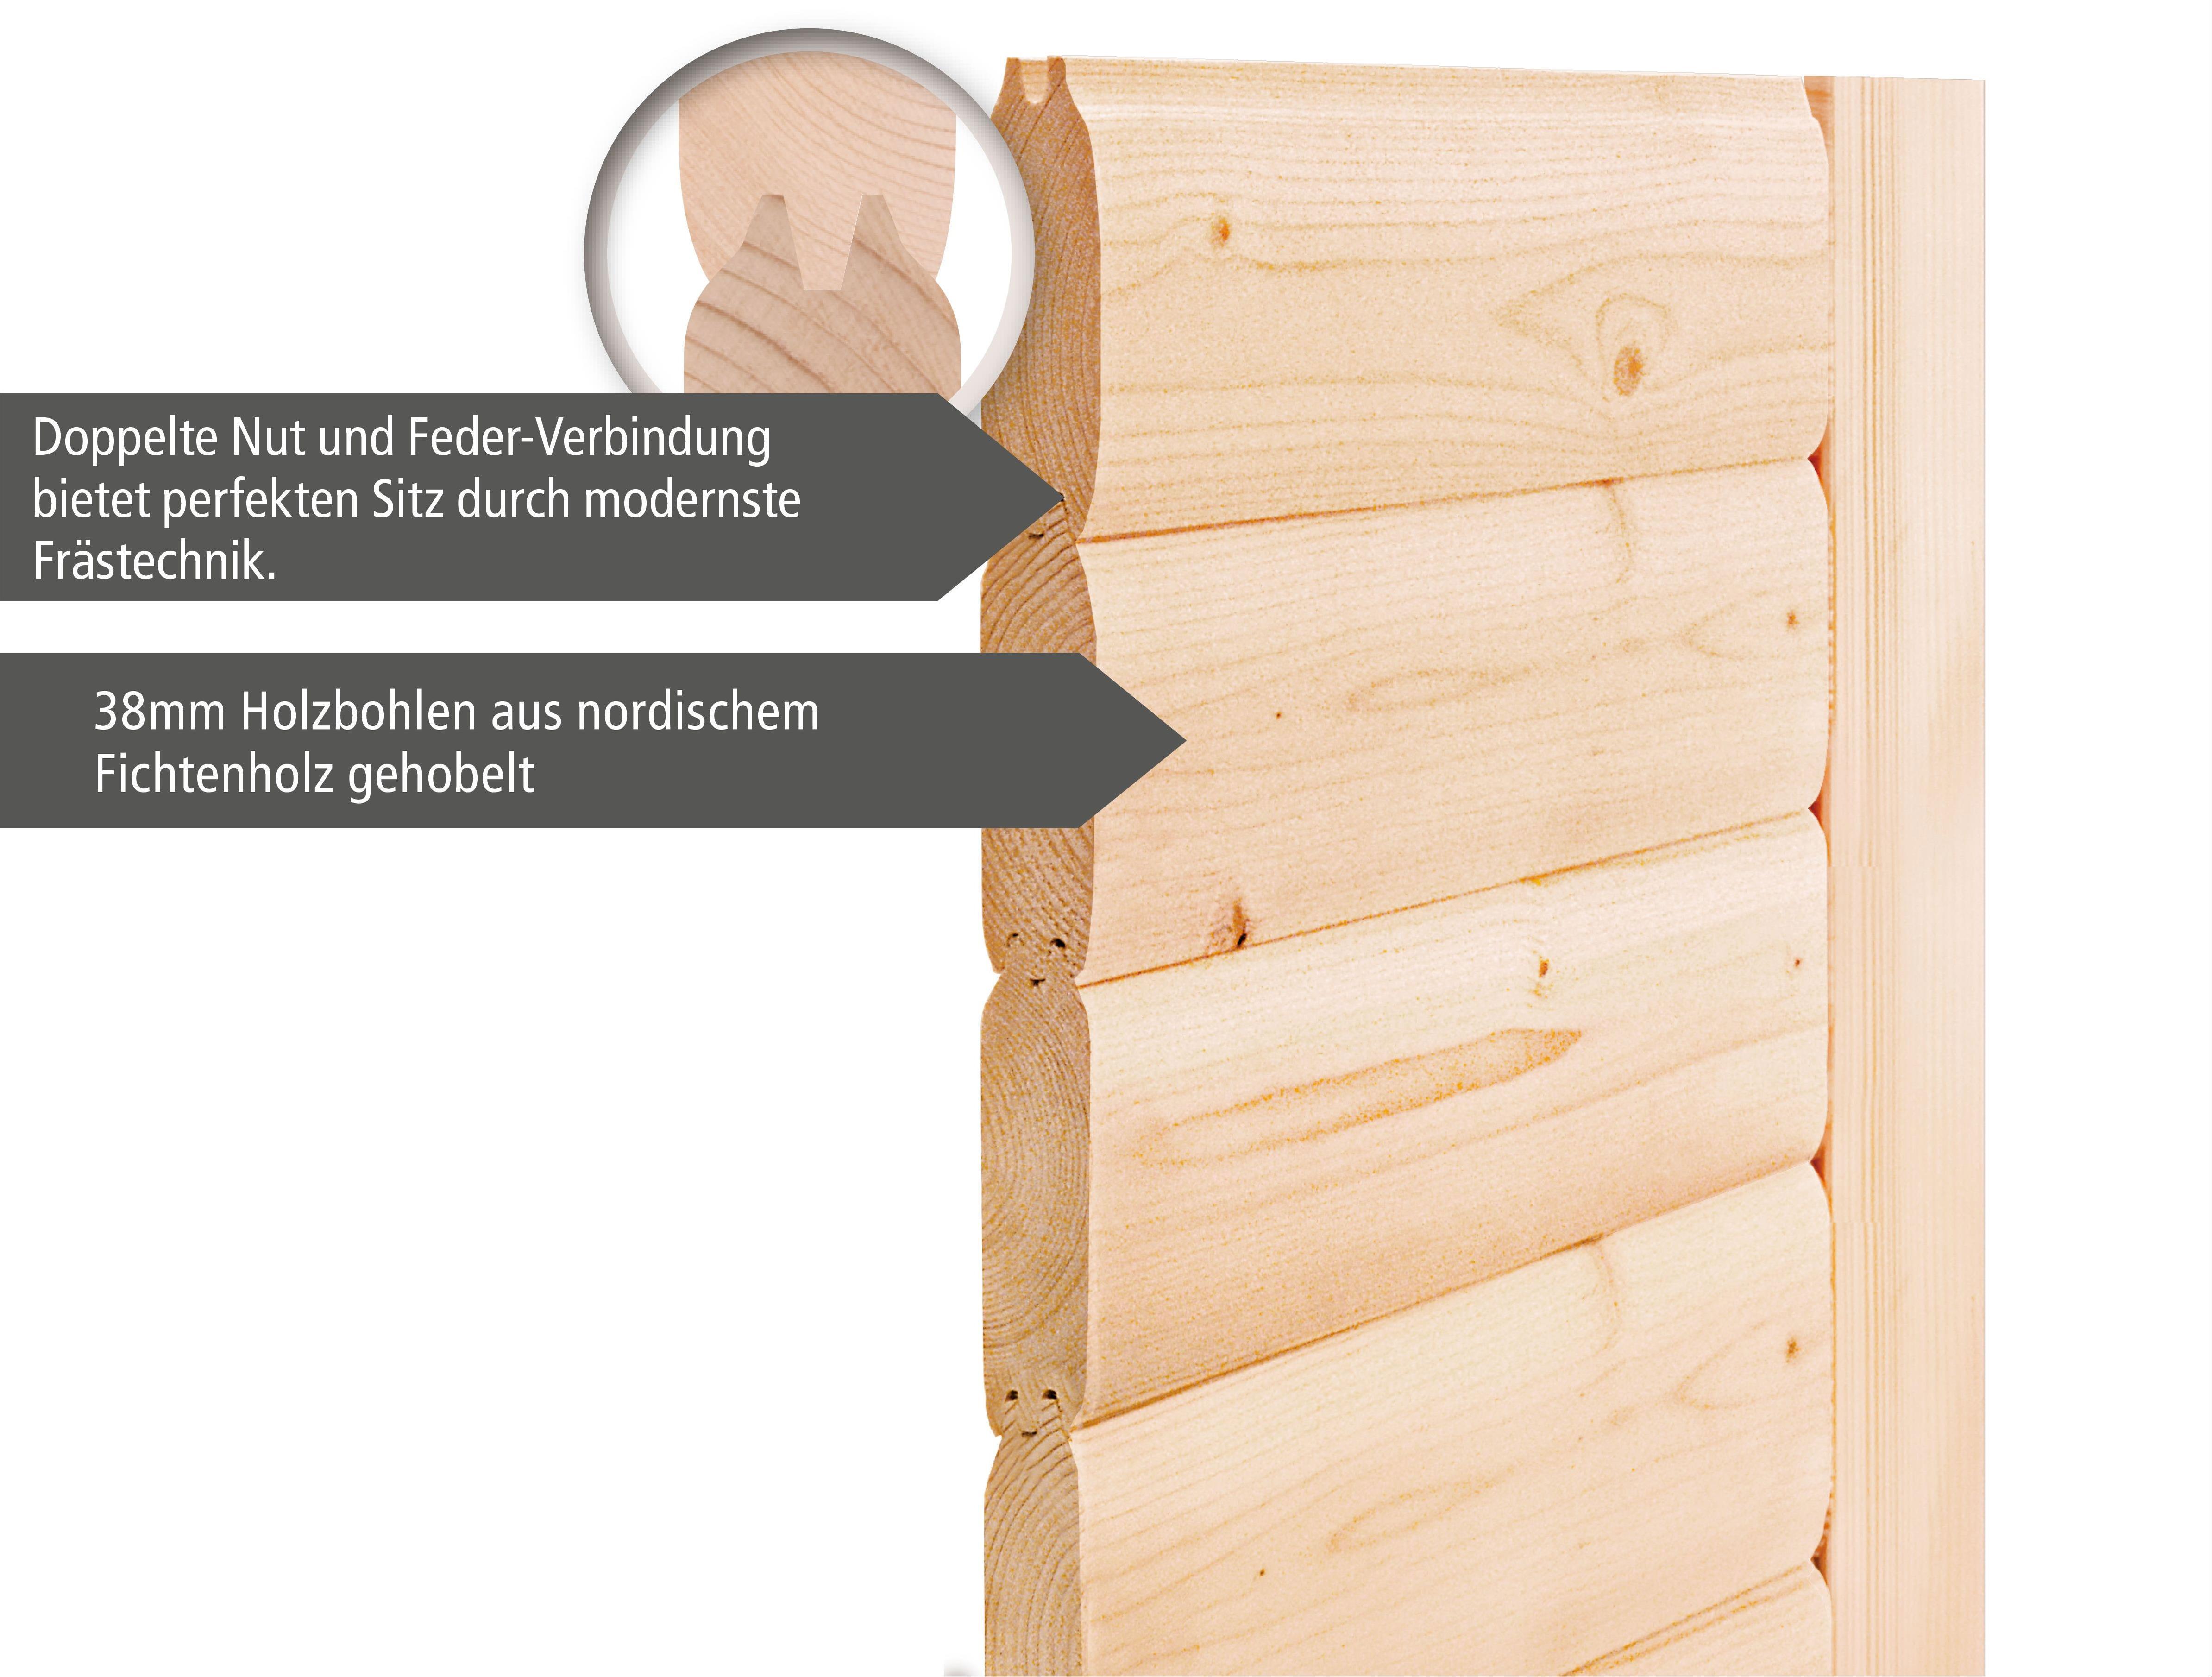 Woodfeeling Sauna Franka 38mm Bio Saunaofen 9kW ext. Kranz Holztür Bild 5